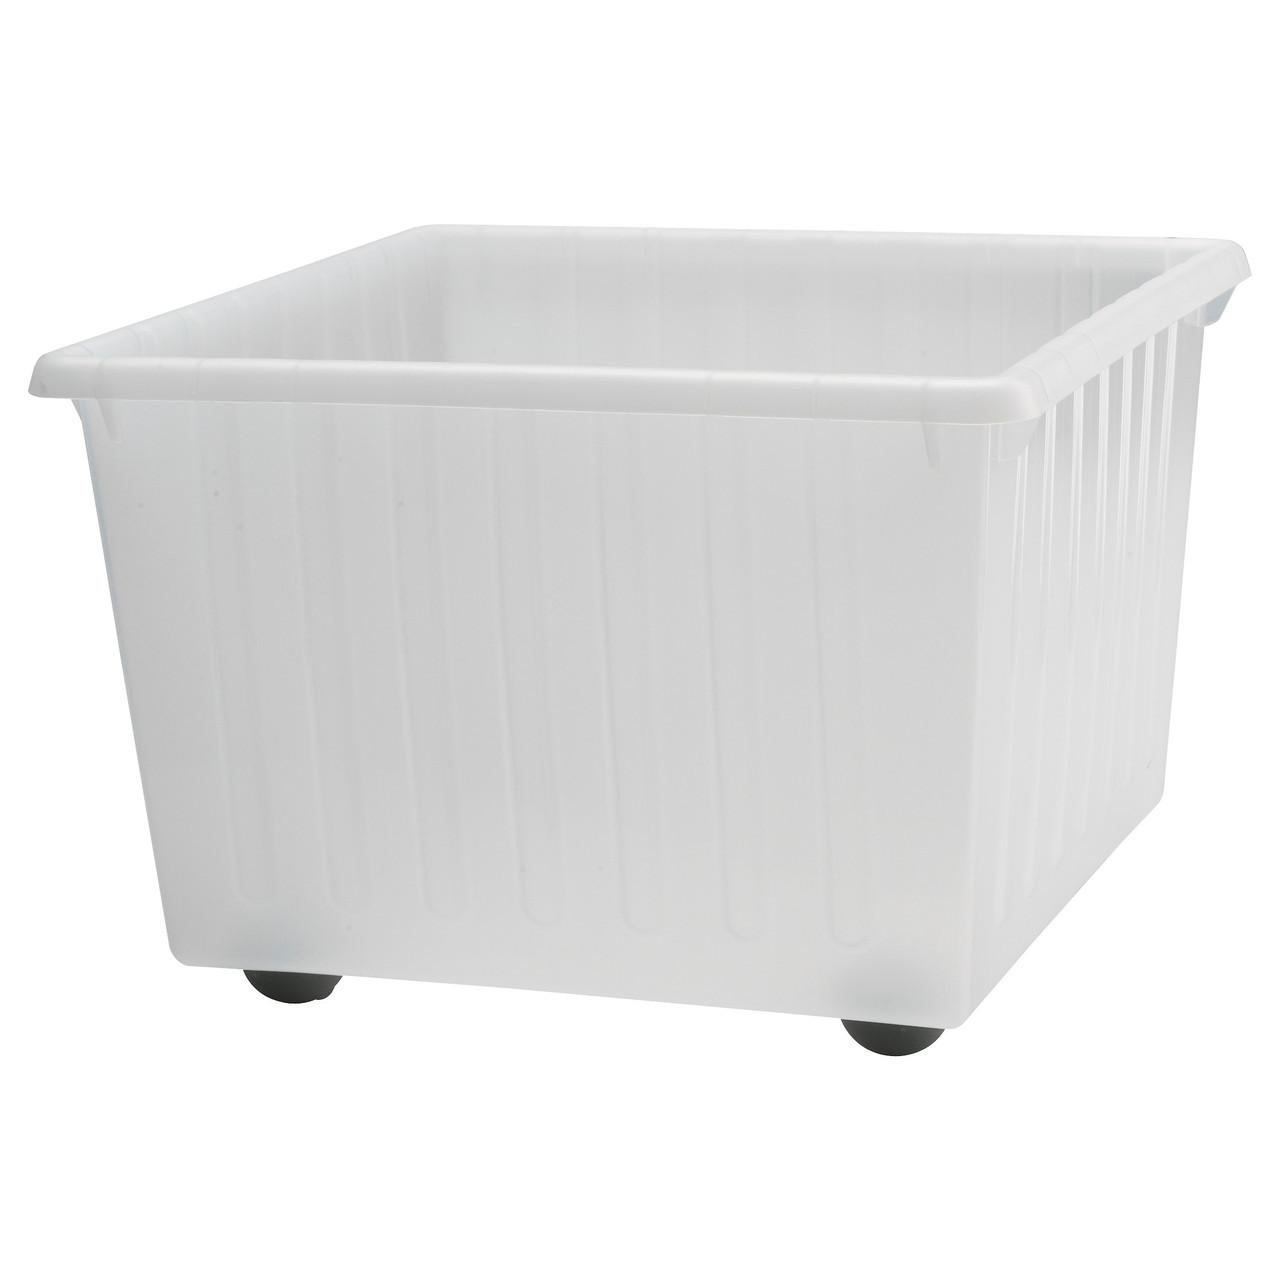 ВЕССЛА Ящик на колесах, белый, 39x39 см 30064849 IKEA, ИКЕА, VESSLA